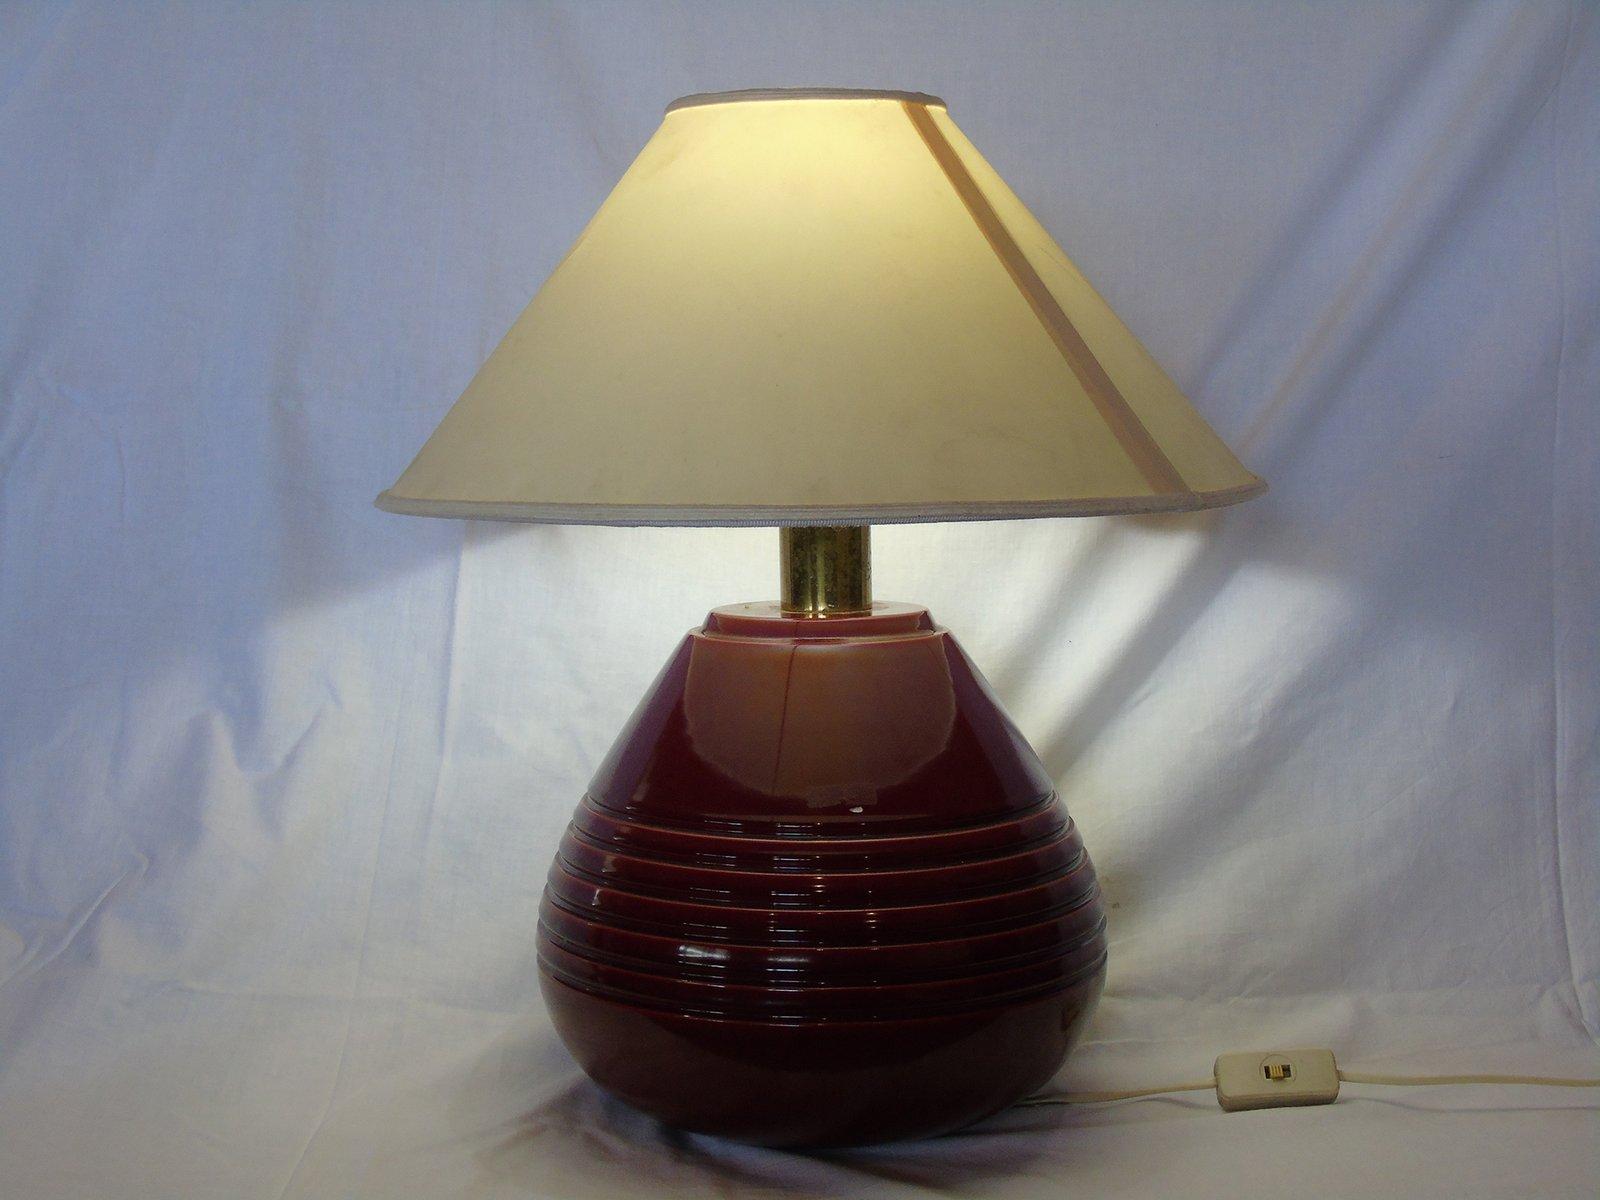 Rote Vintage Keramik Tischlampe, 1960er